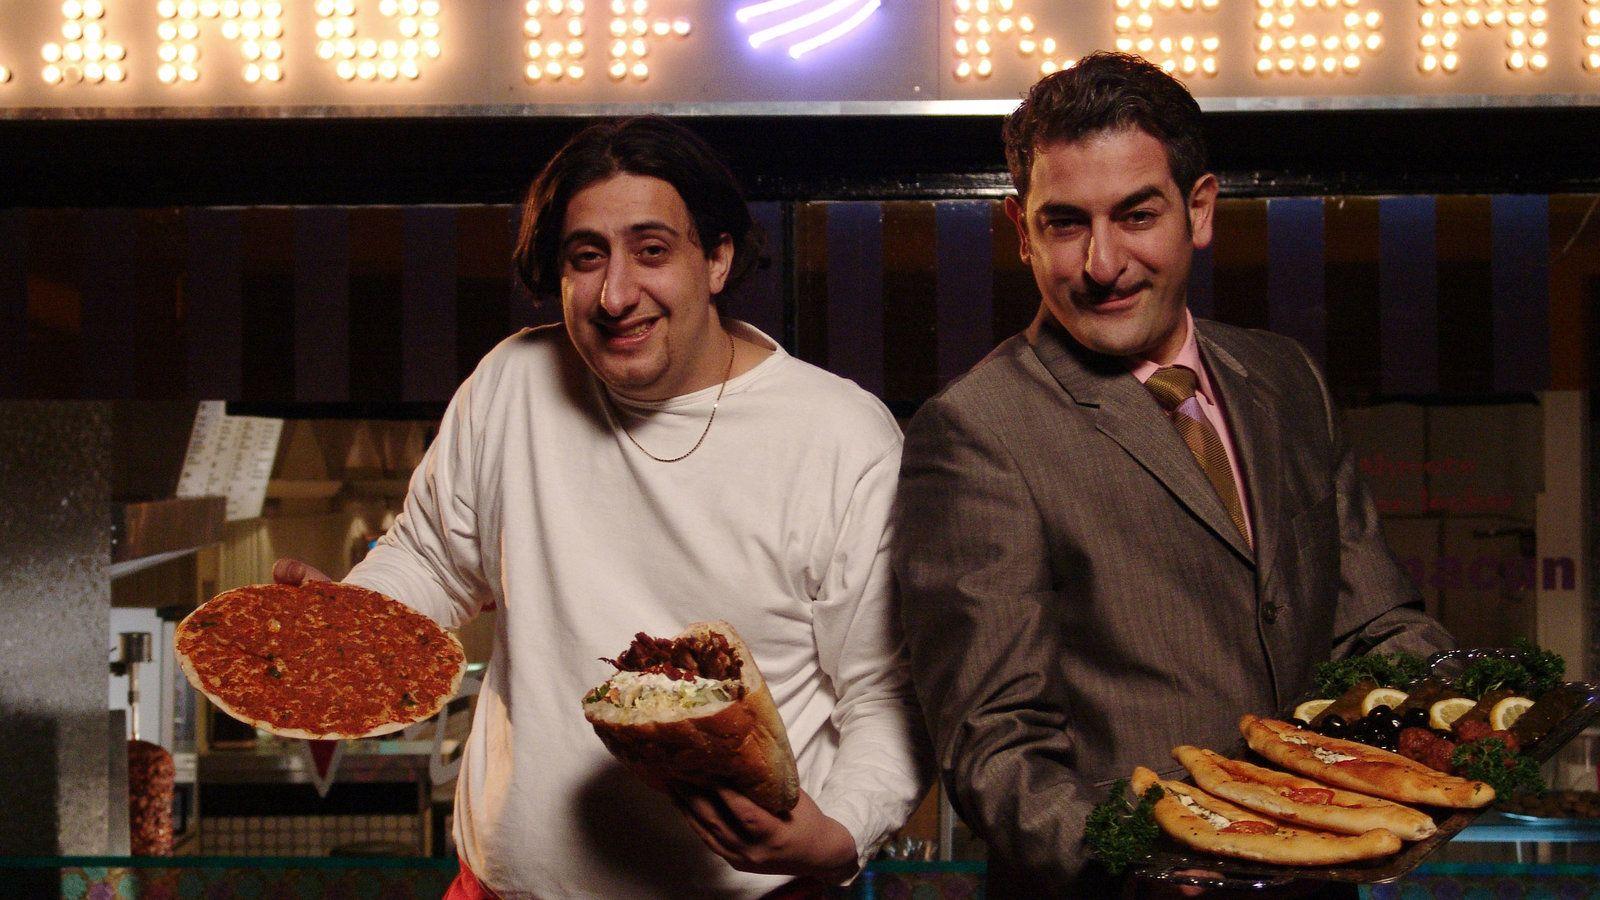 (POSTPONED) Film Screening: Kebab Connection